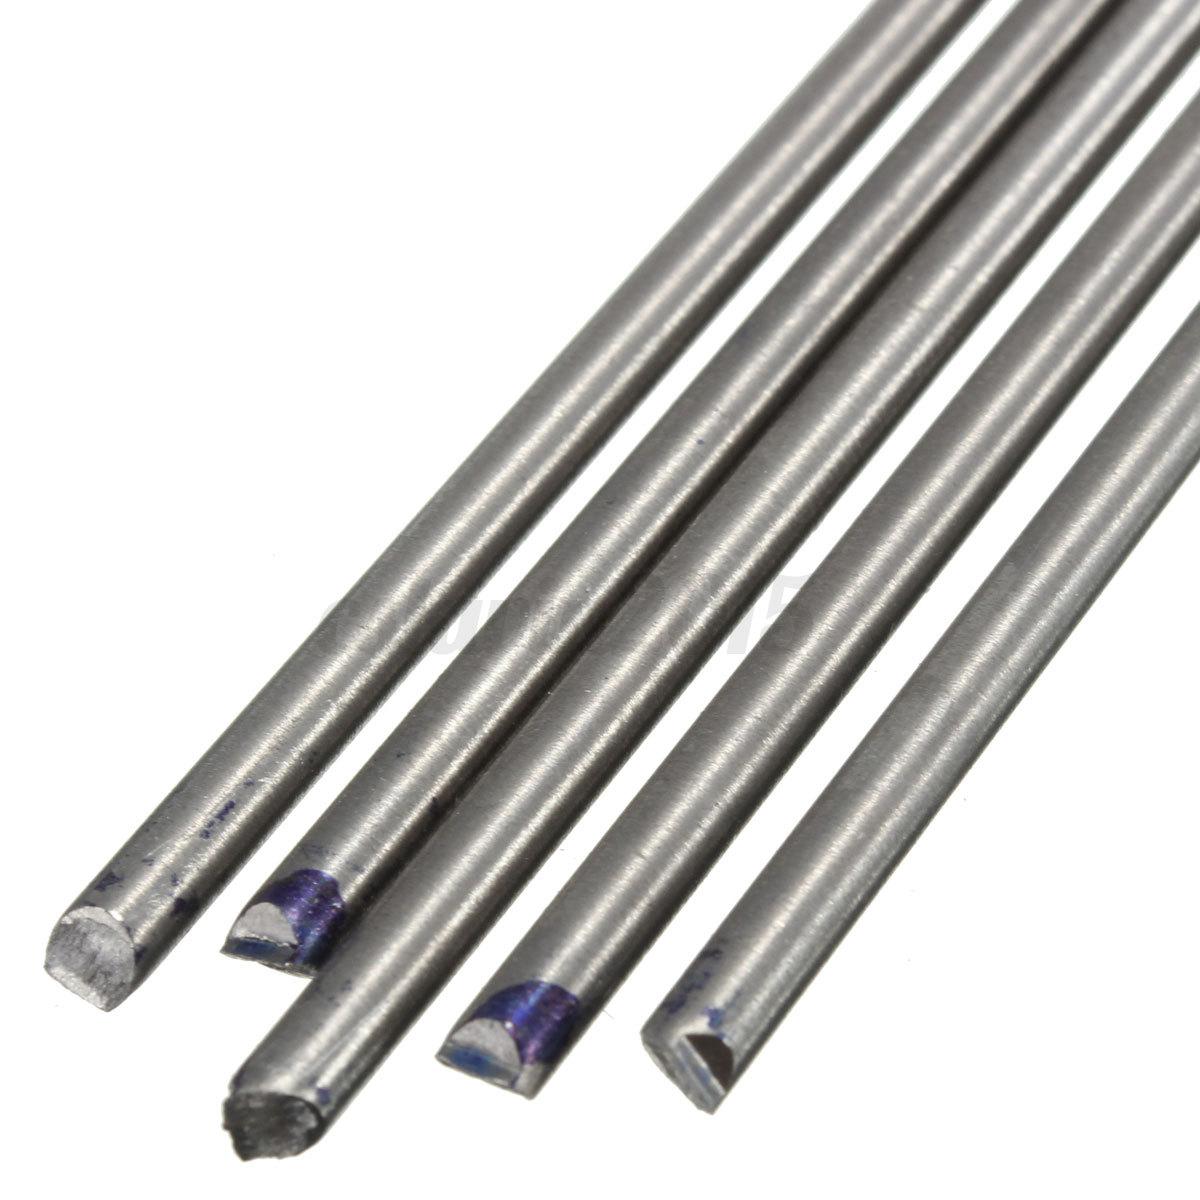 Pcs titanium ti grade gr metal rod diameter mm